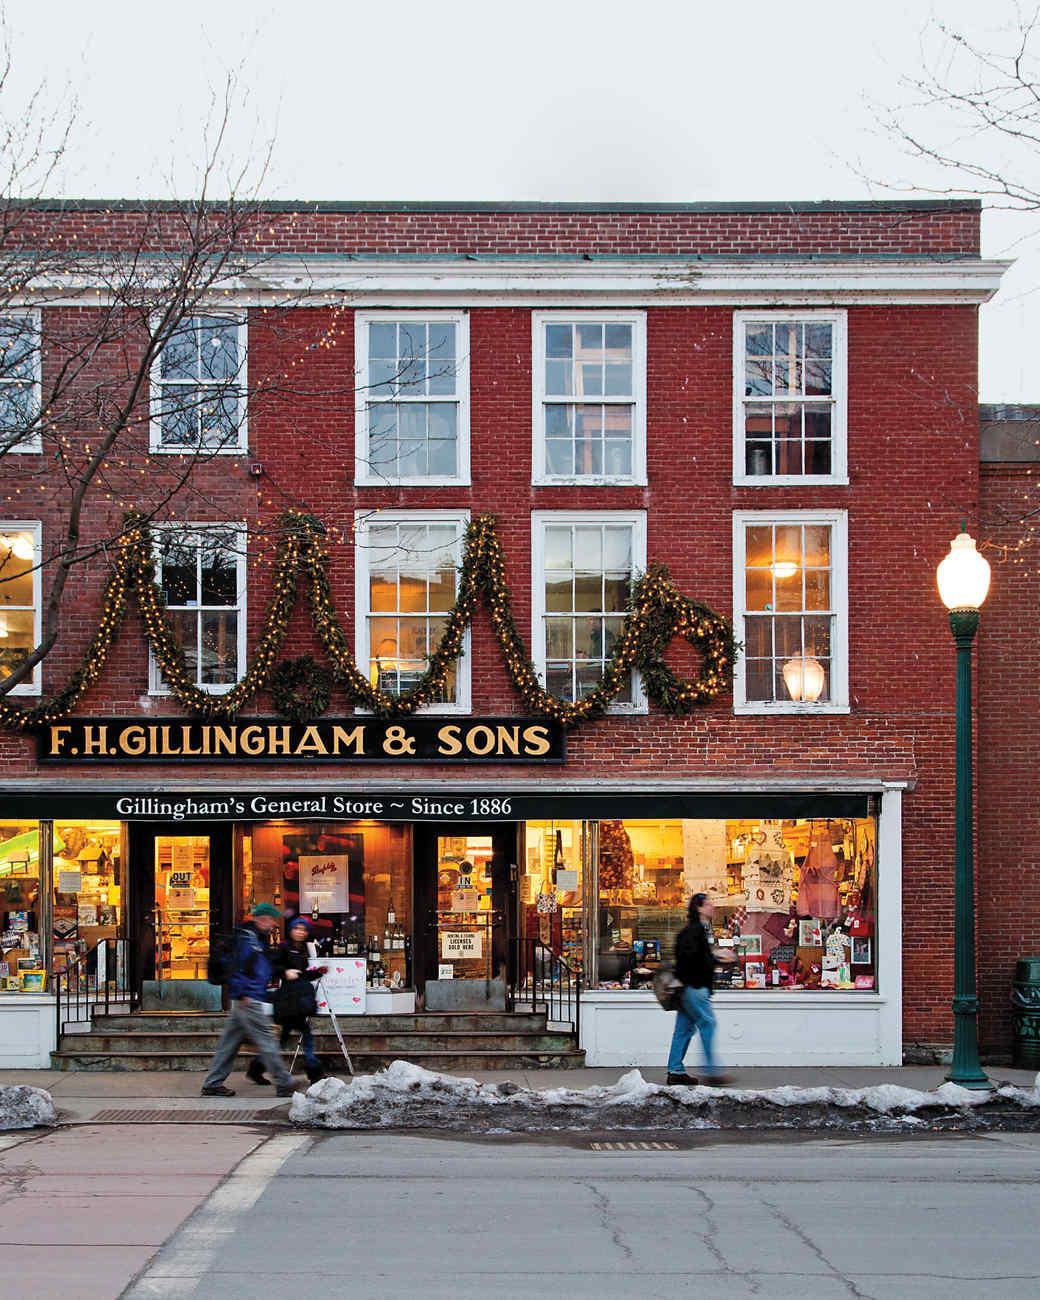 gillinghams-general-store-0605-md109181.jpg